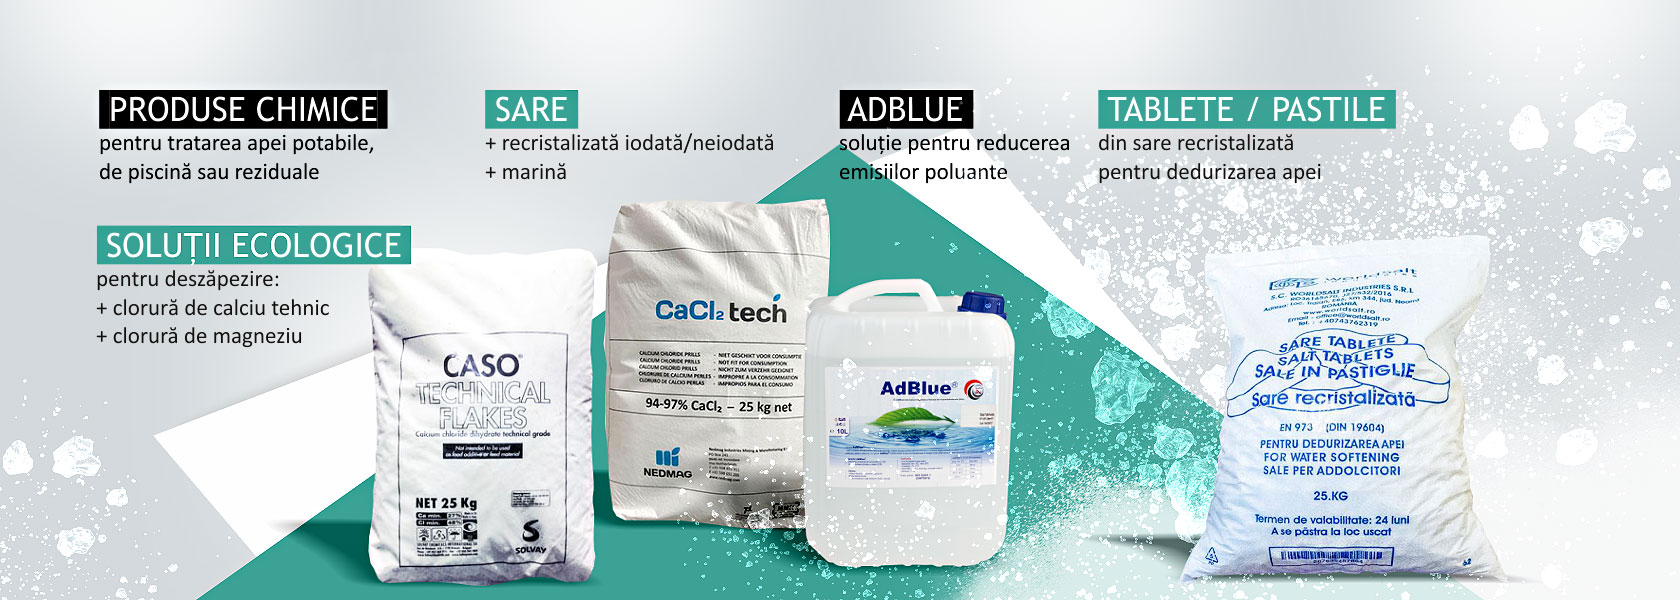 tablete pastile de sare recristalizata dedurizare apa